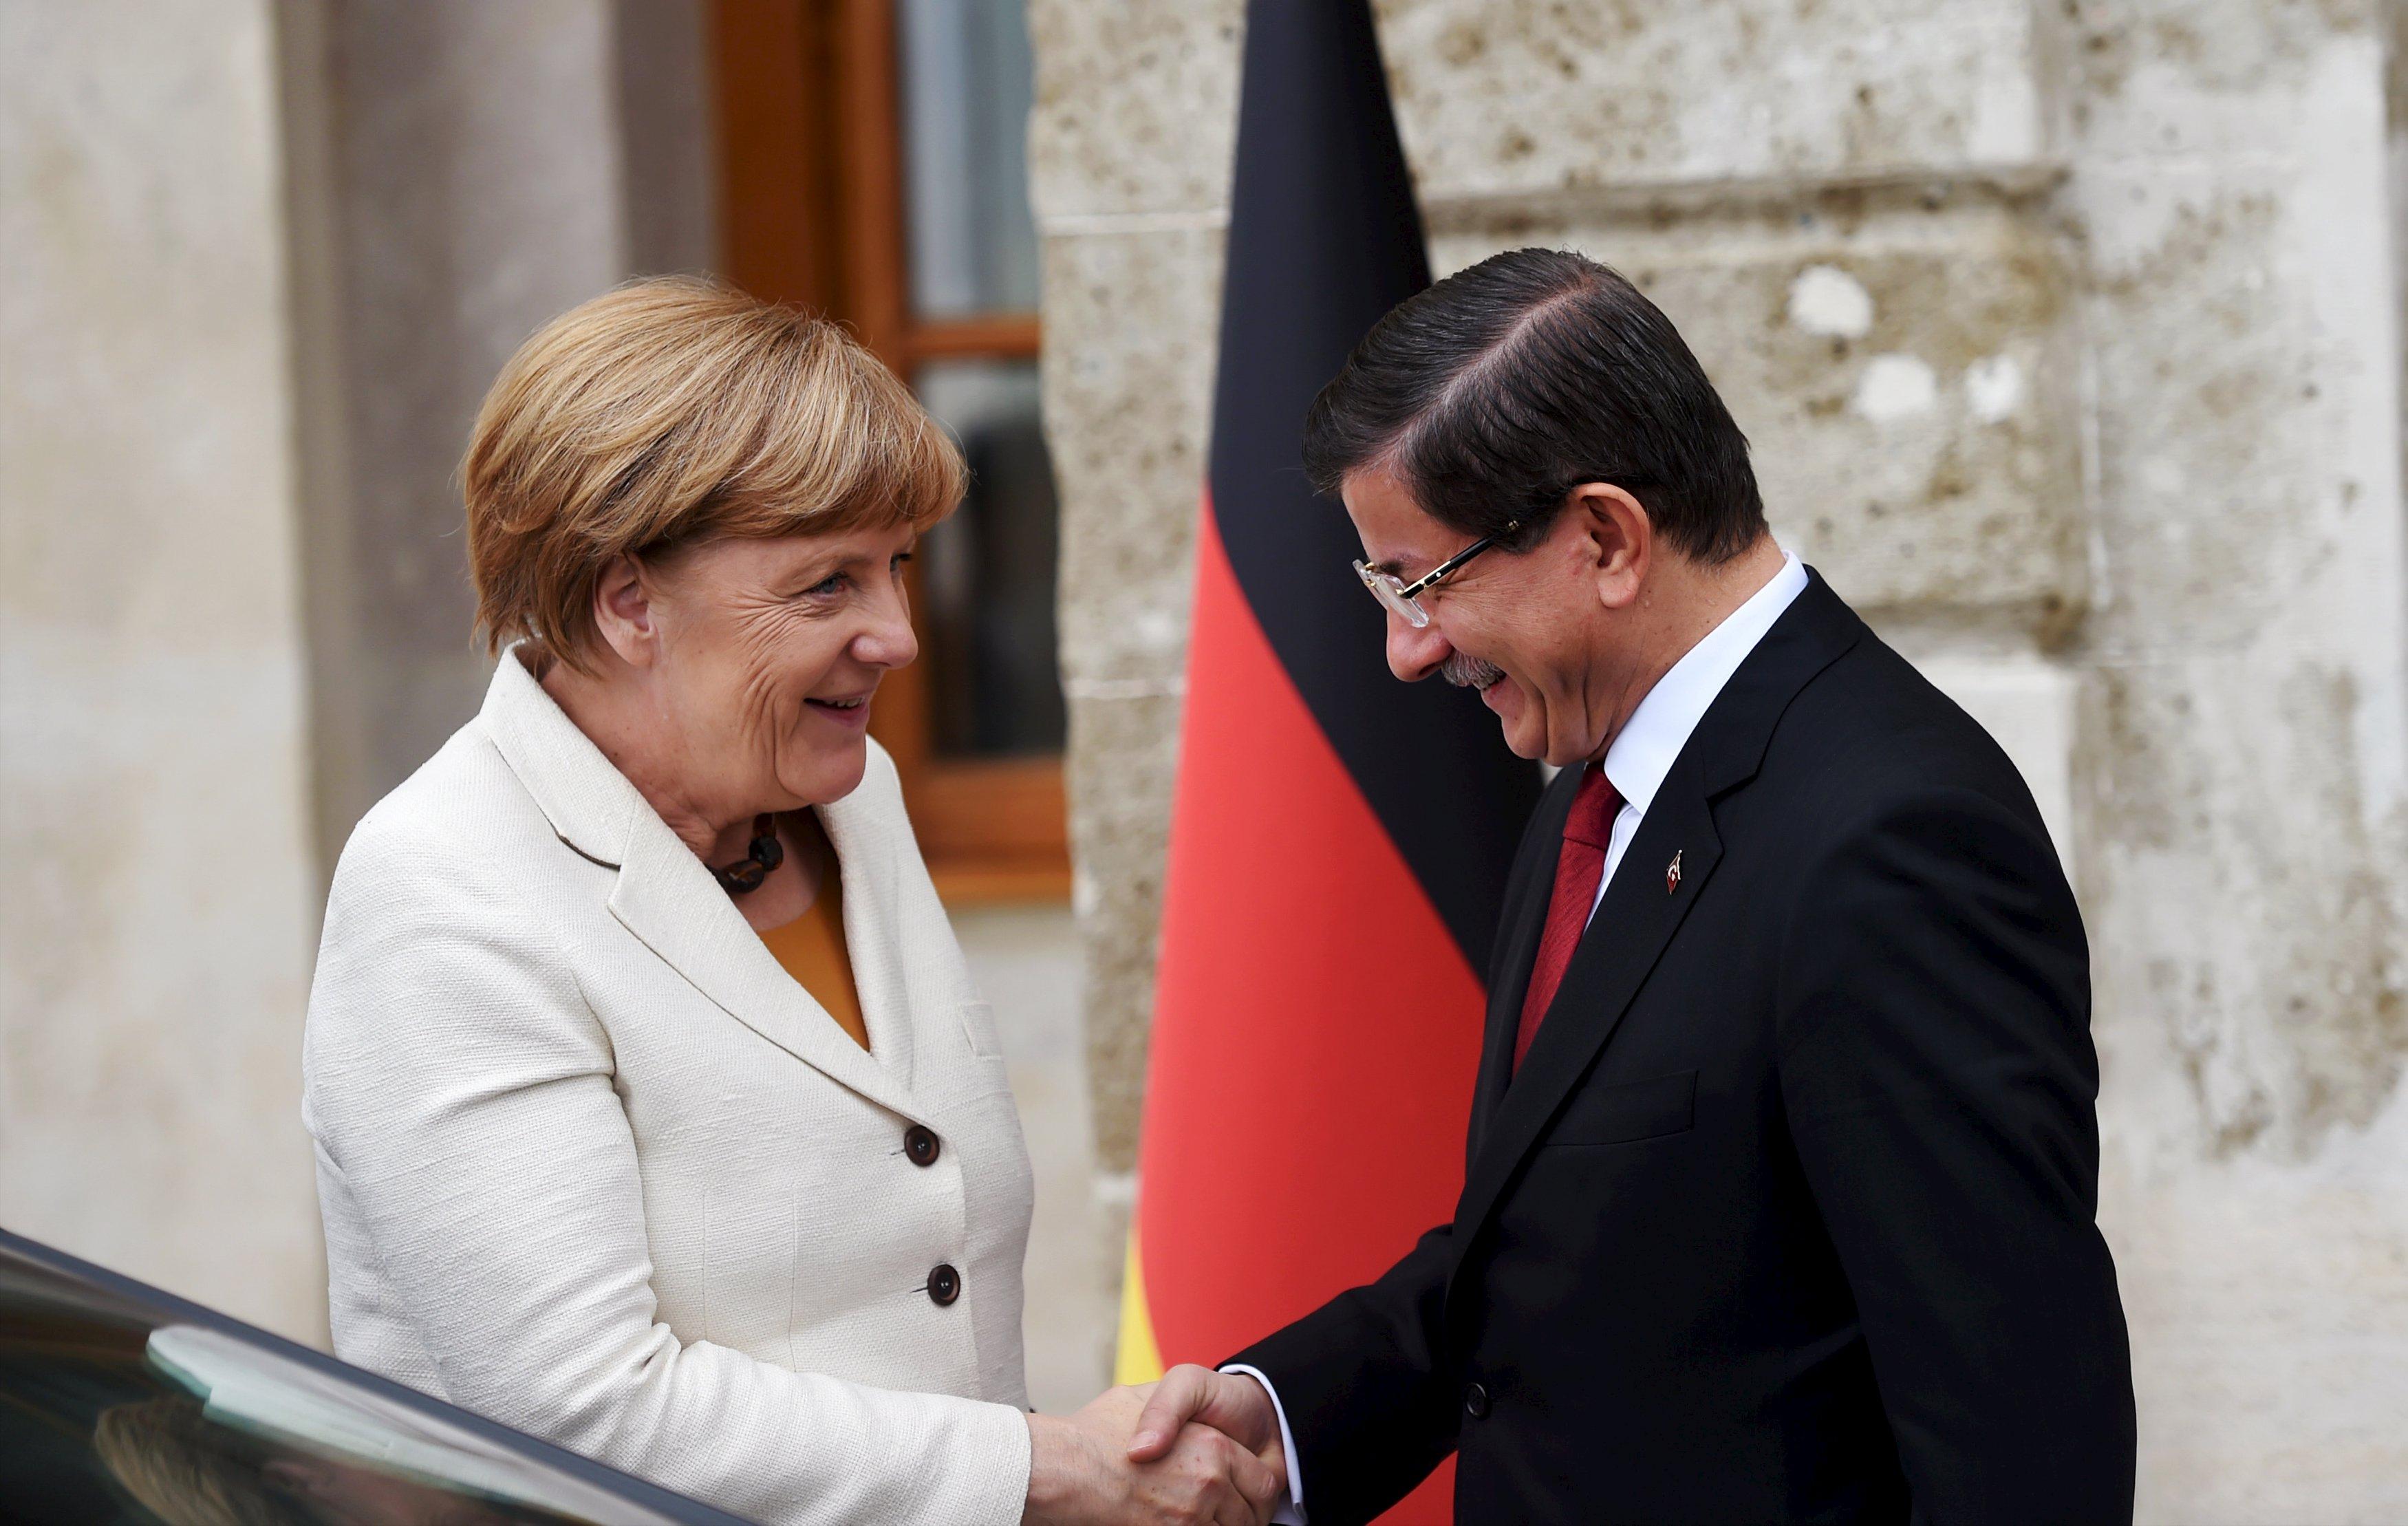 Perdana Menteri Turki Ahmet Davutoglu (kanan) berjabat tangan dengan Kanselir Jerman Angela Merkel sebelum pertemuan mereka di Istanbul, Turki, 18 Oktober 2015. Merkel berkunjung ke Istanbul pada hari Minggu berusaha meminta bantuan Turki untuk membendung arus migran dari Timur Tengah ke Eropa, tapi tanpa terlihat mengorbankan hak asasi manusia mereka. ANTARA FOTO/REUTERS/Bulent Kilic.